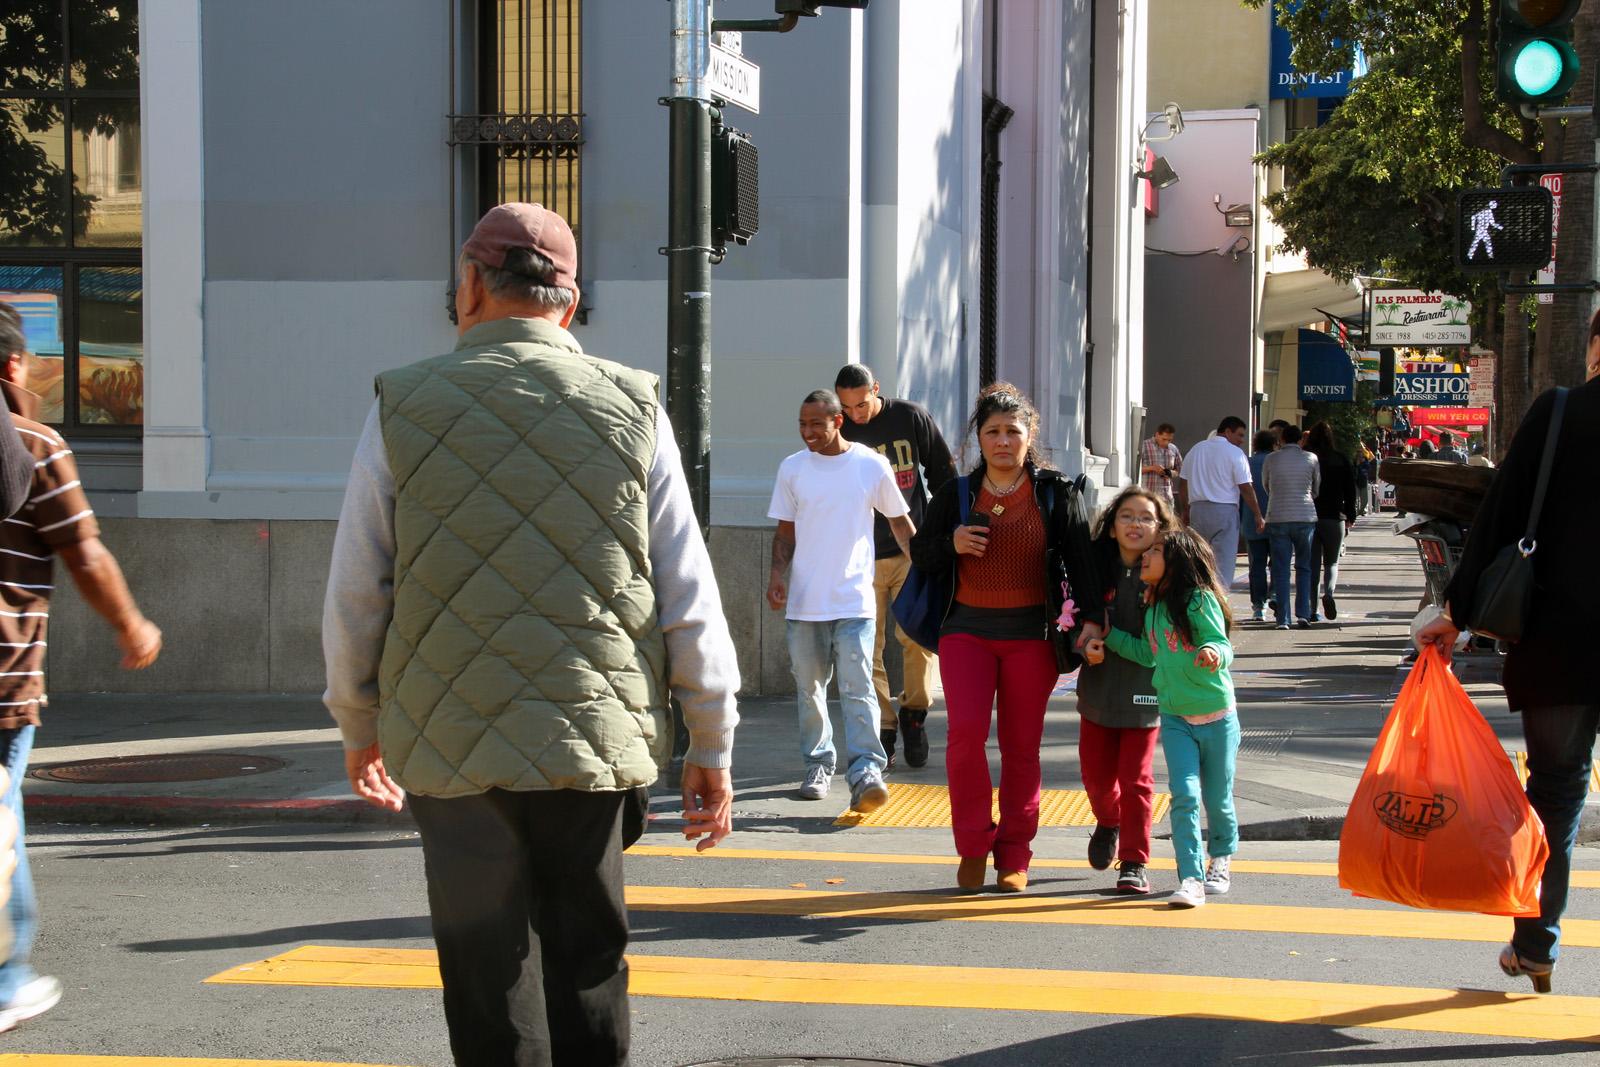 SNAP: Crosswalk